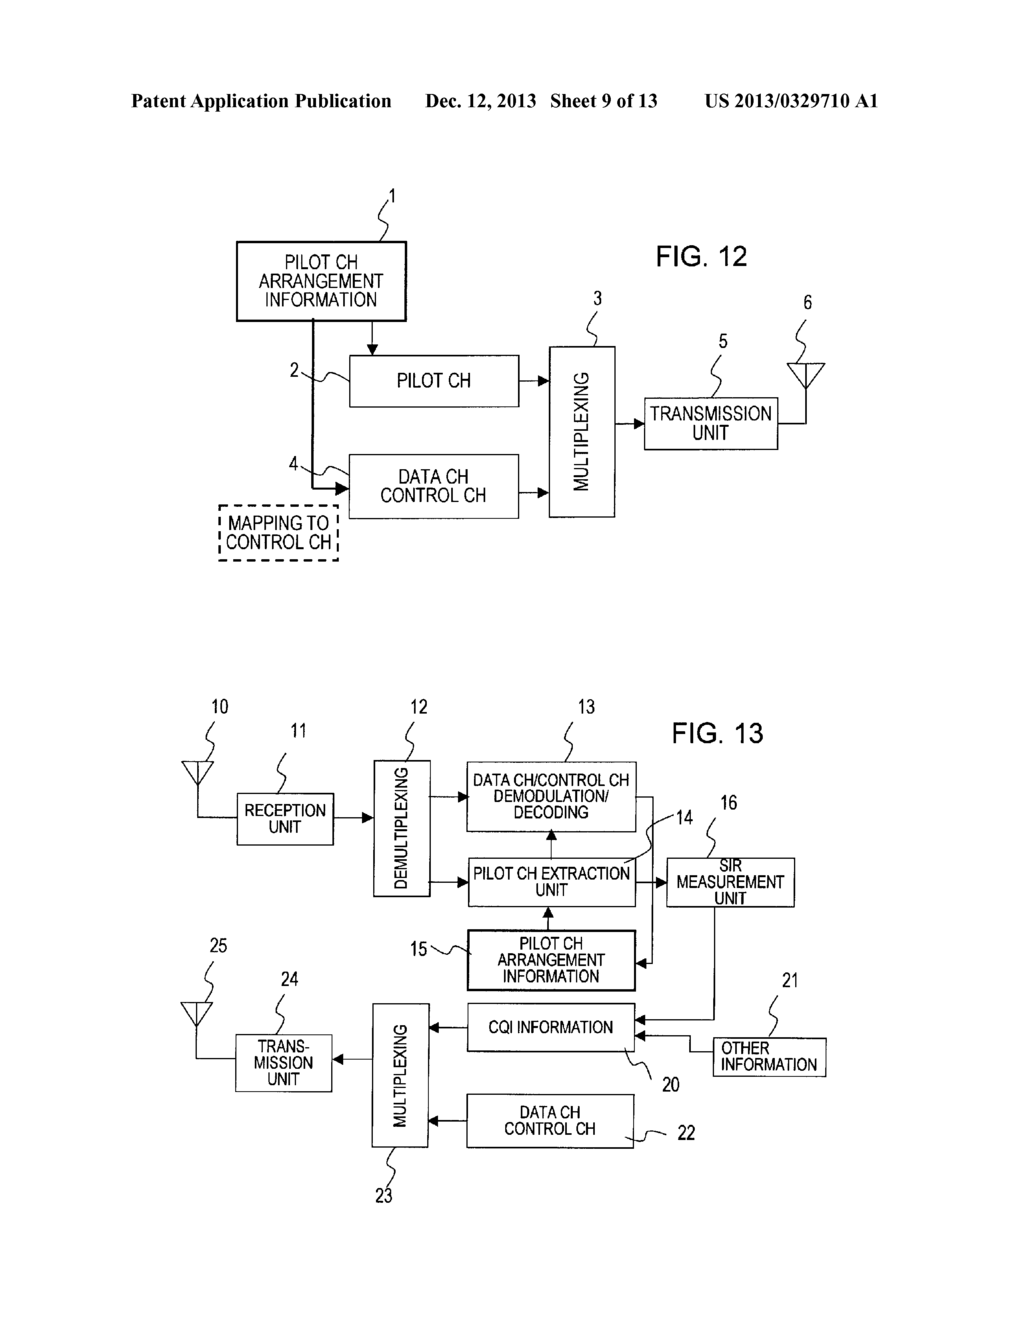 Pilot Arrangement Method In Mobile Radio Communication System And Fmtransmittercircuitdiagrampng Transmitter Receiver Adopting Same Diagram Schematic Image 10